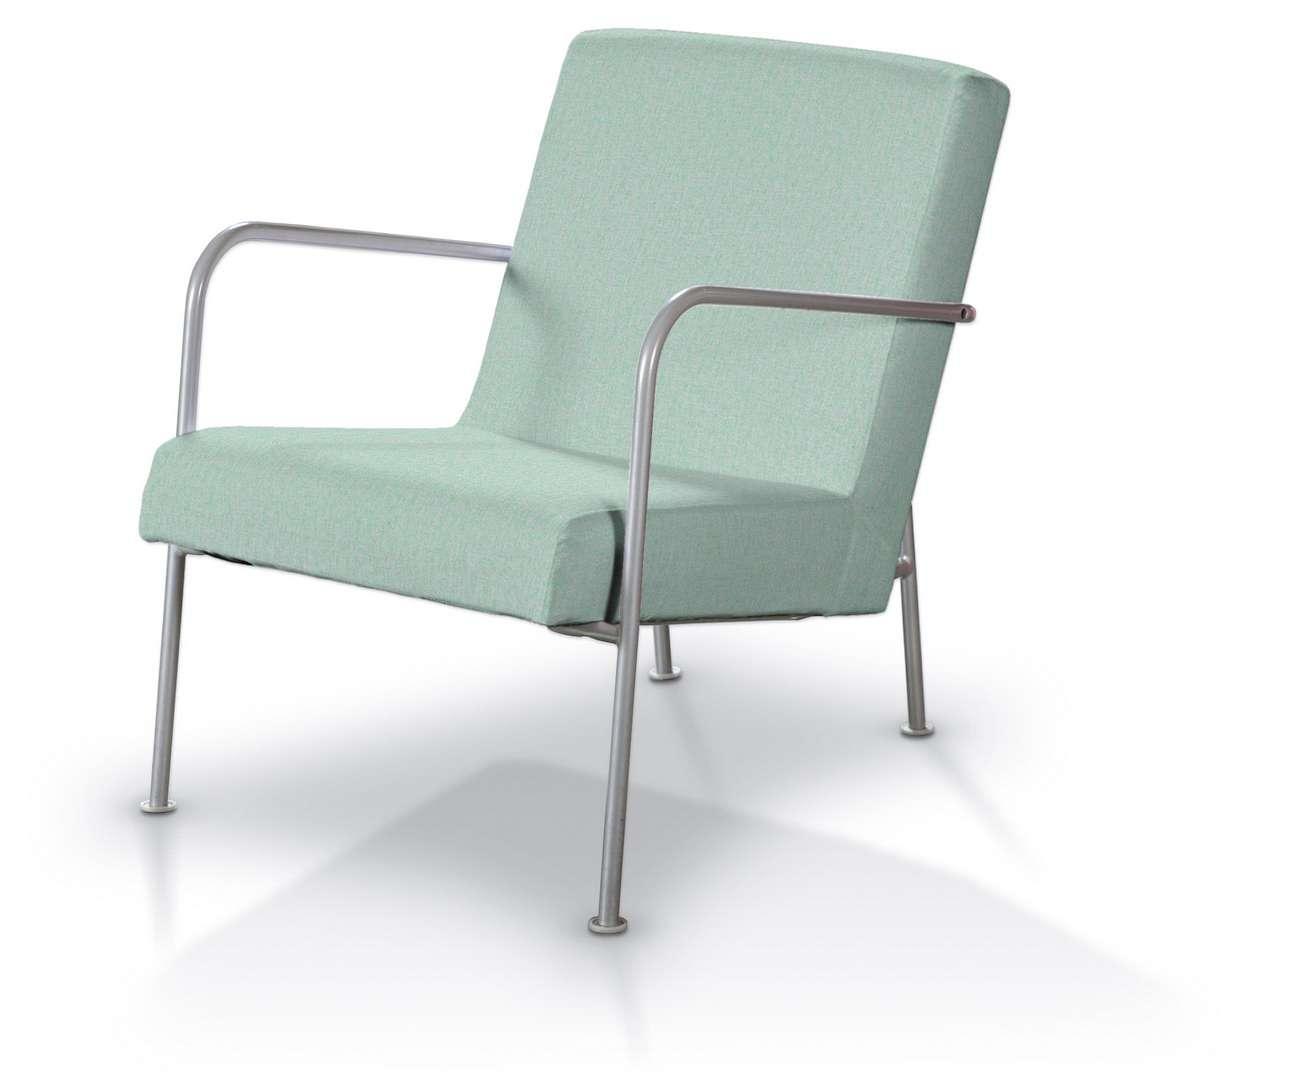 Potah na křeslo Ikea PS v kolekci Living, látka: 161-61